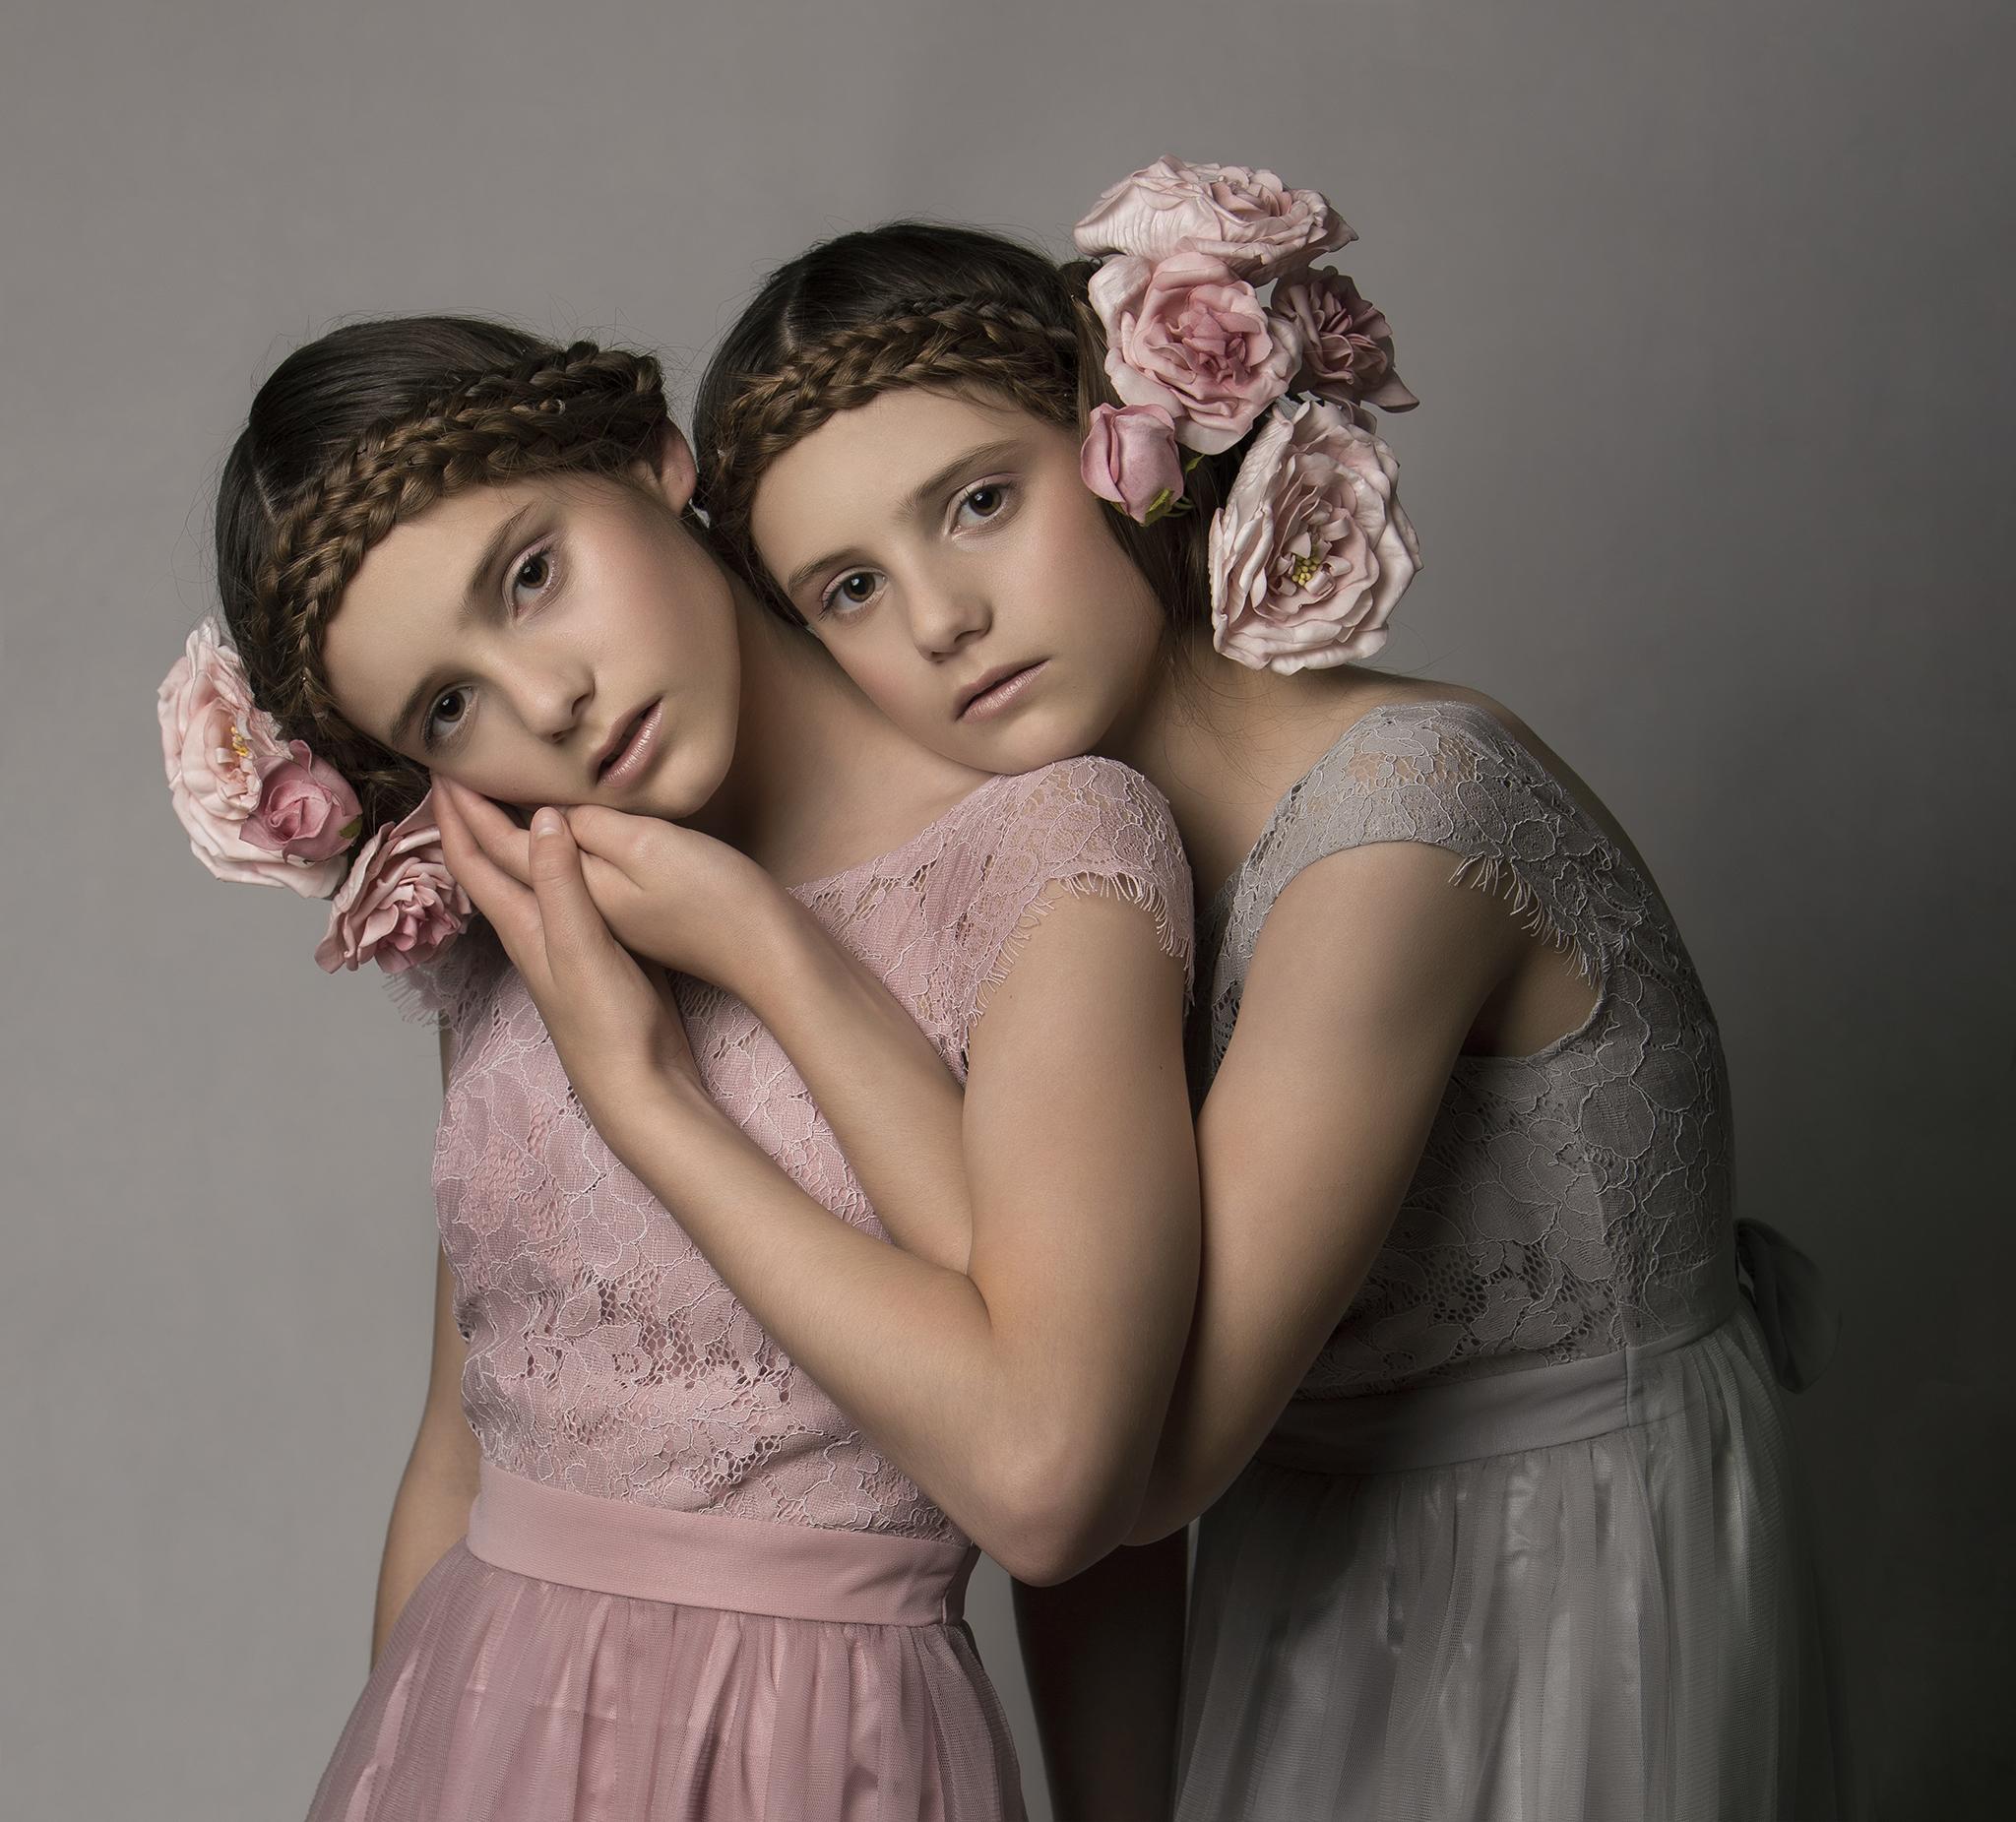 elizabethgphotography_kingslangley_hertfordshire_fineart_childrens_photography_66.jpg